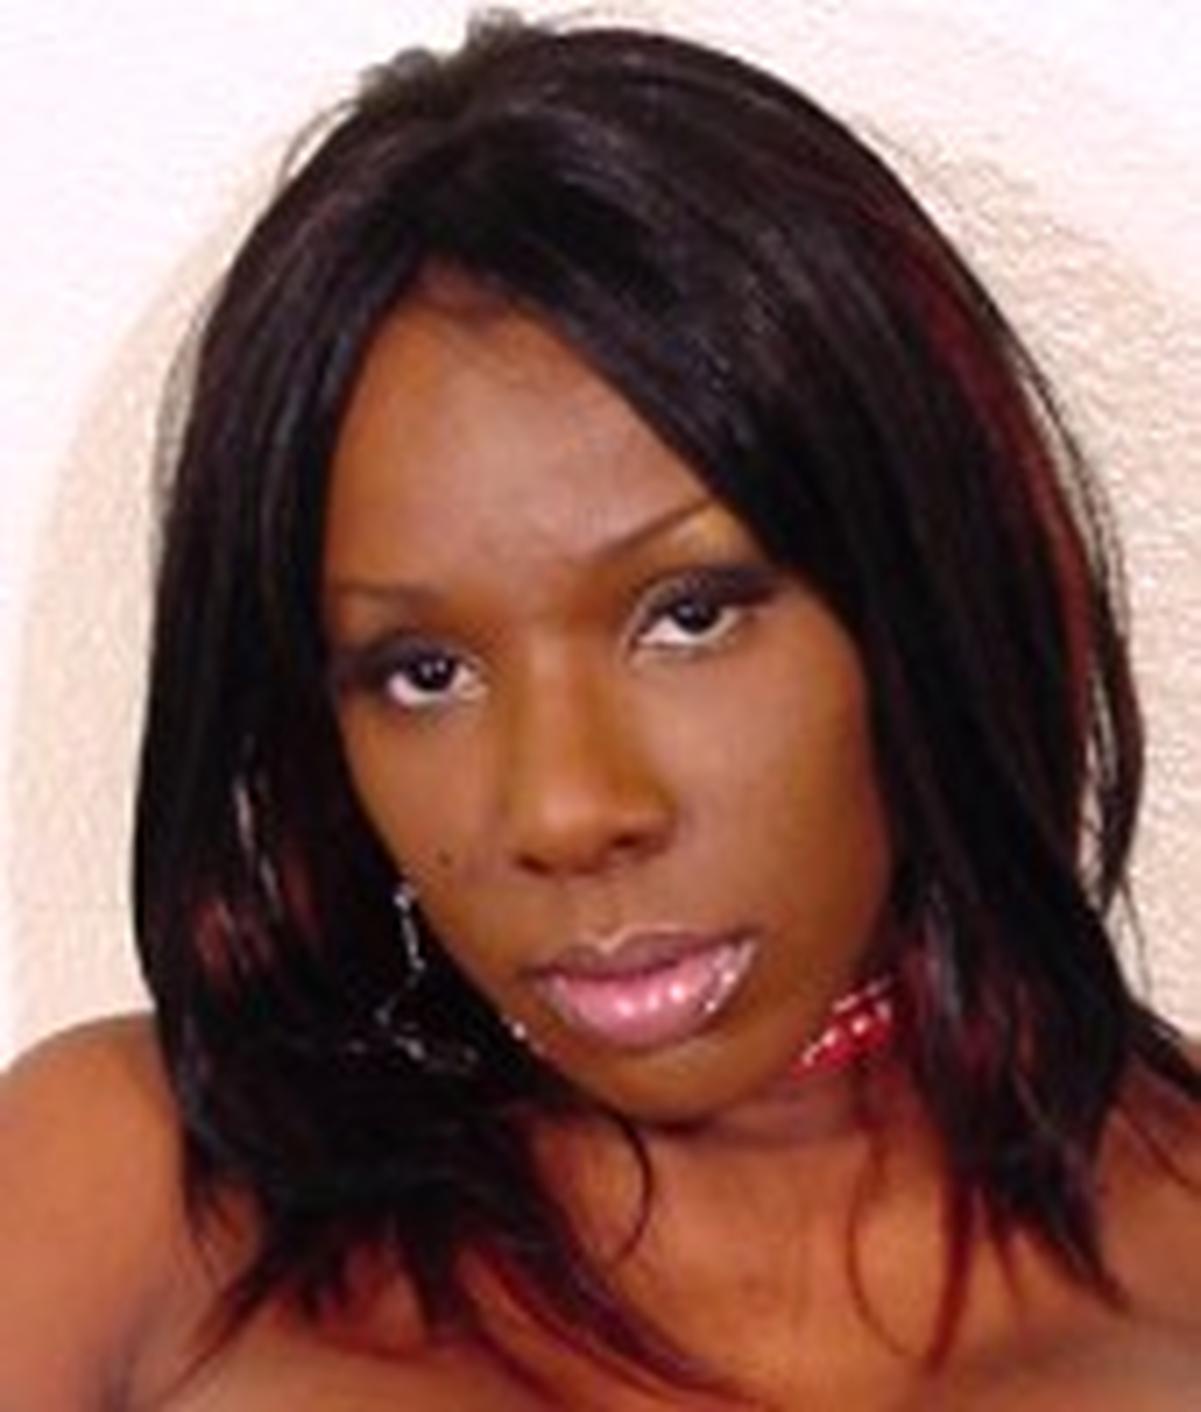 Kelly Starr | Wiki | Everipedia